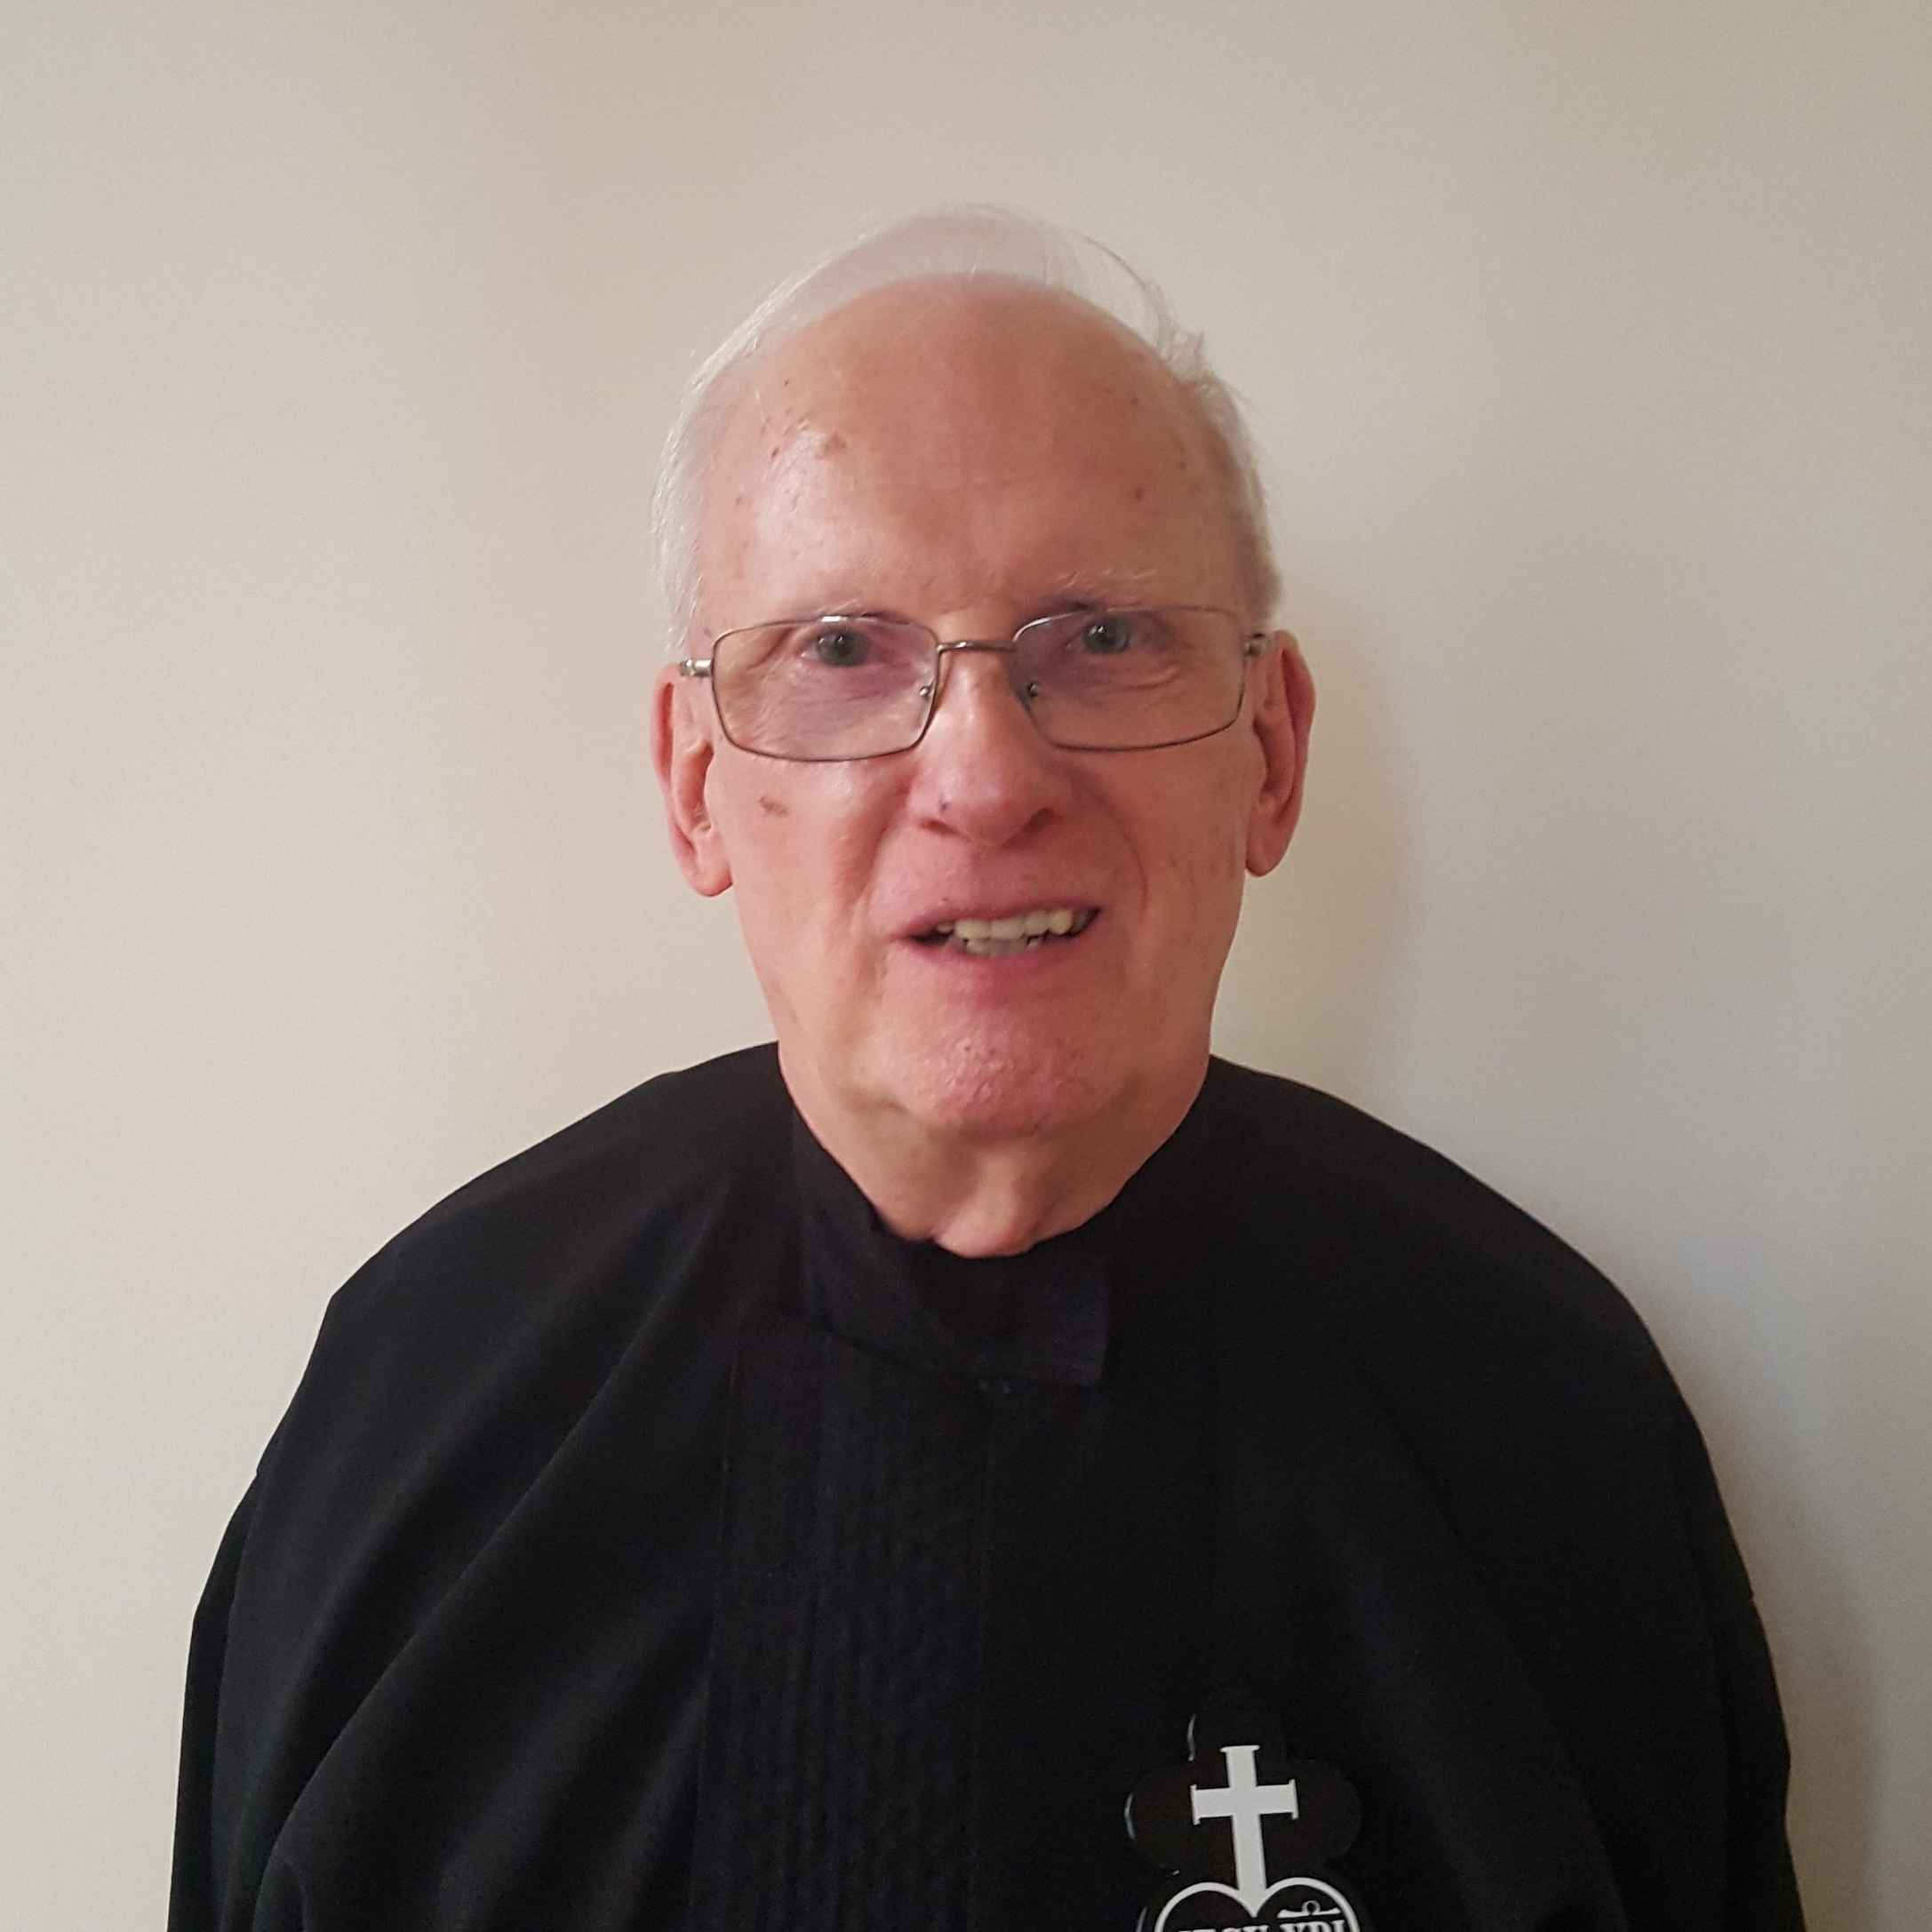 Br. Terence Skorka, C.P. - tskorka@cpprov.org860.760.9758